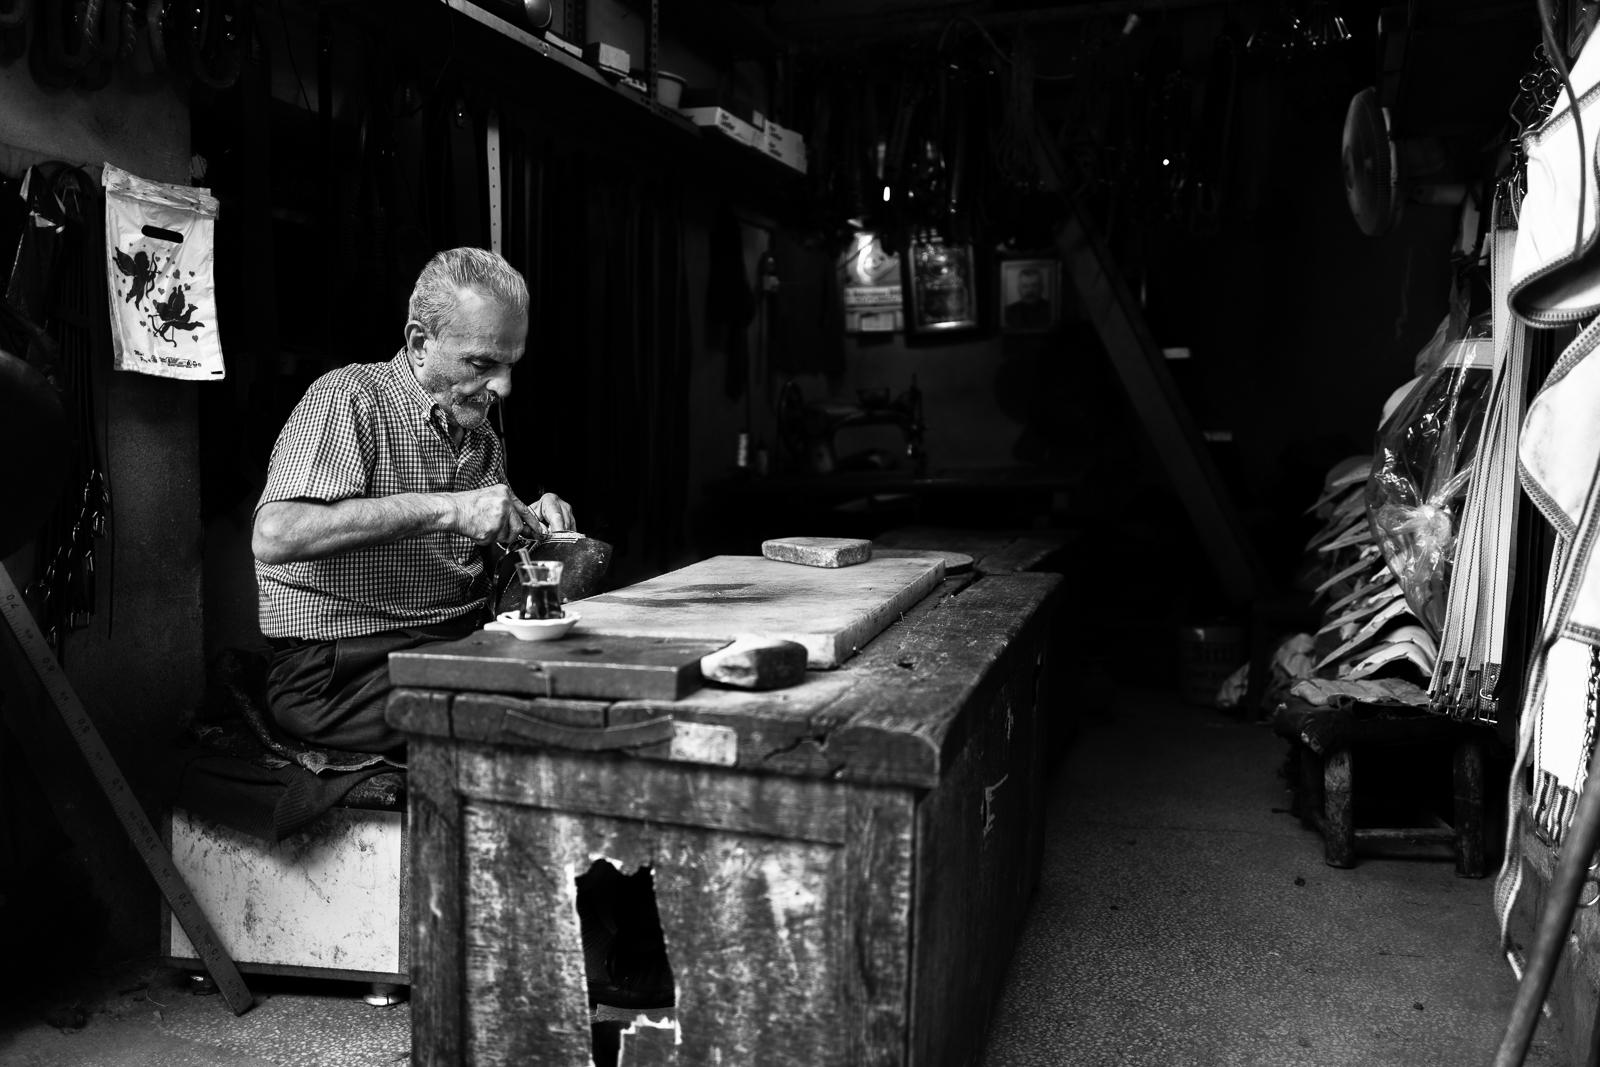 A shoemaker in Diyarbakir (Turkey)